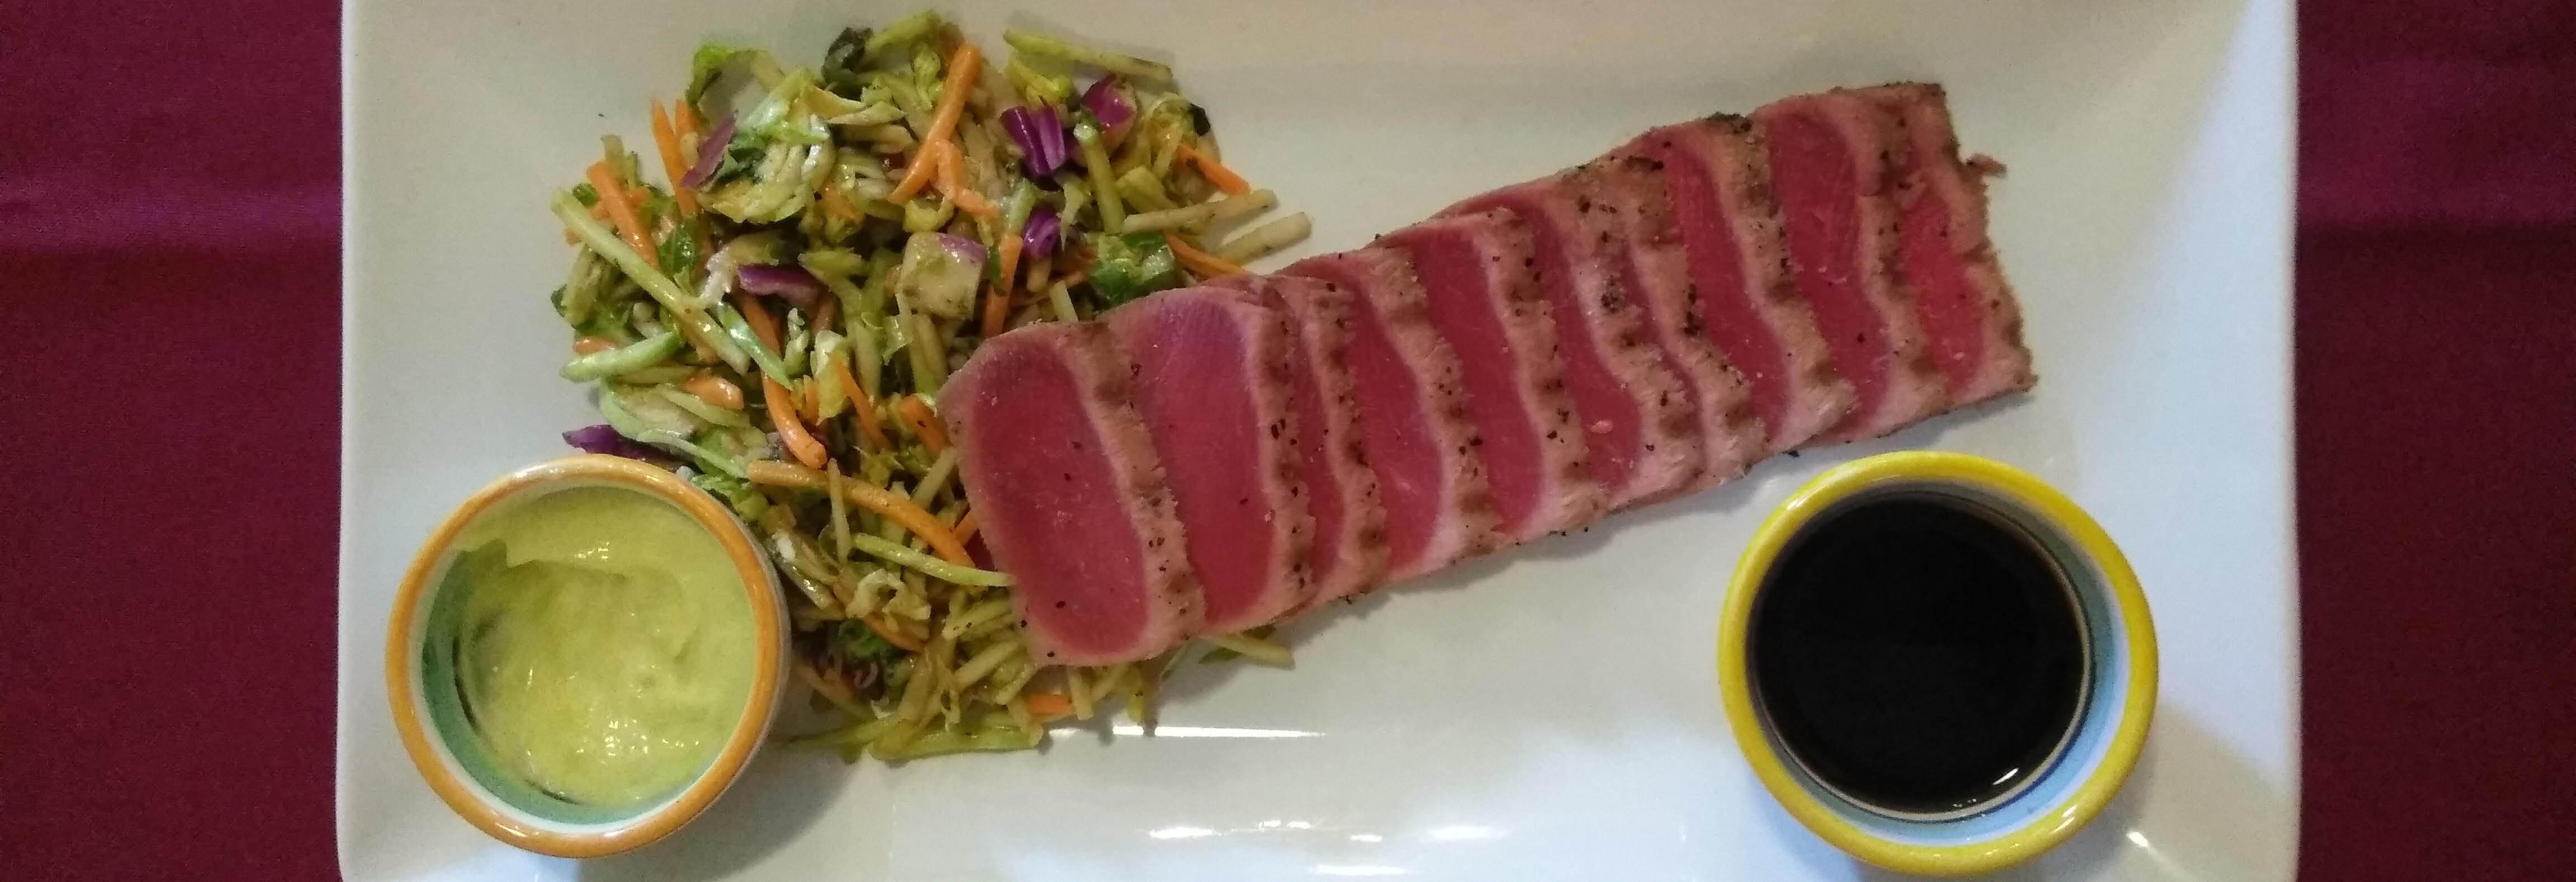 Ahi Tuna & Lemon Rocket Salad Sunday Brunches